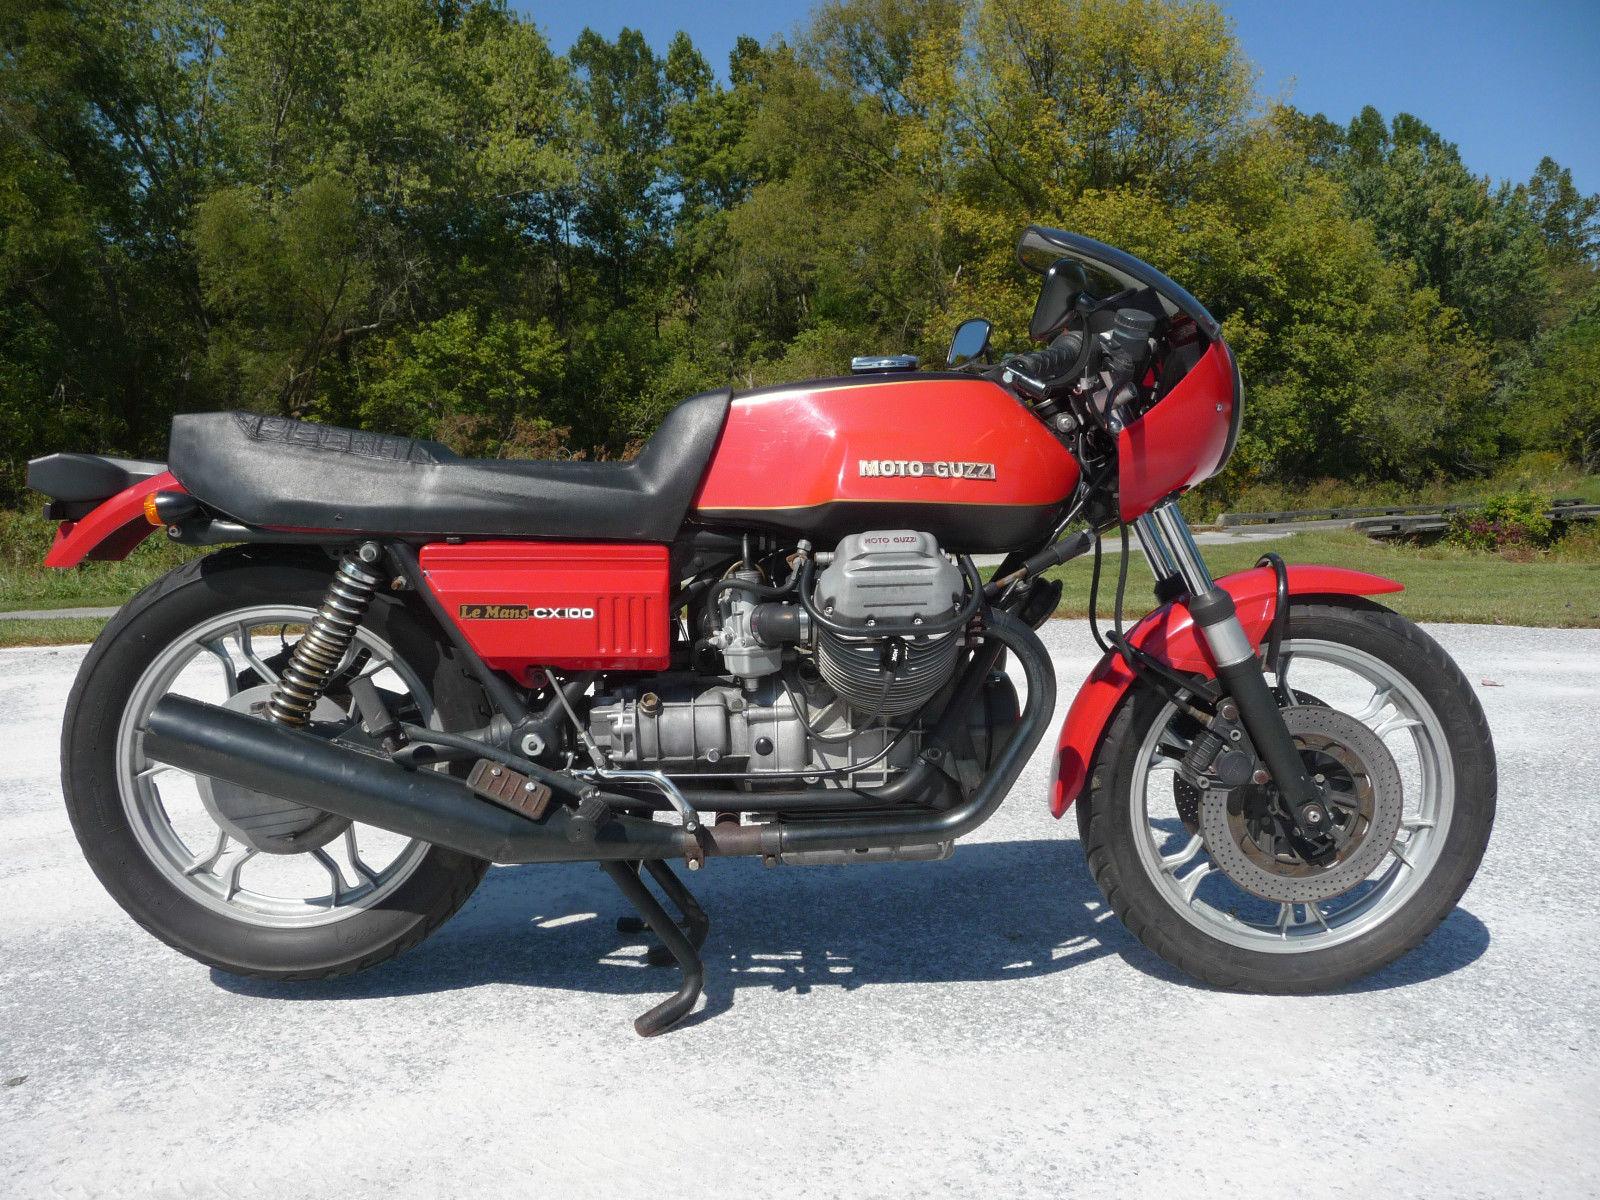 1981 moto guzzi cx100 lemans bike urious. Black Bedroom Furniture Sets. Home Design Ideas